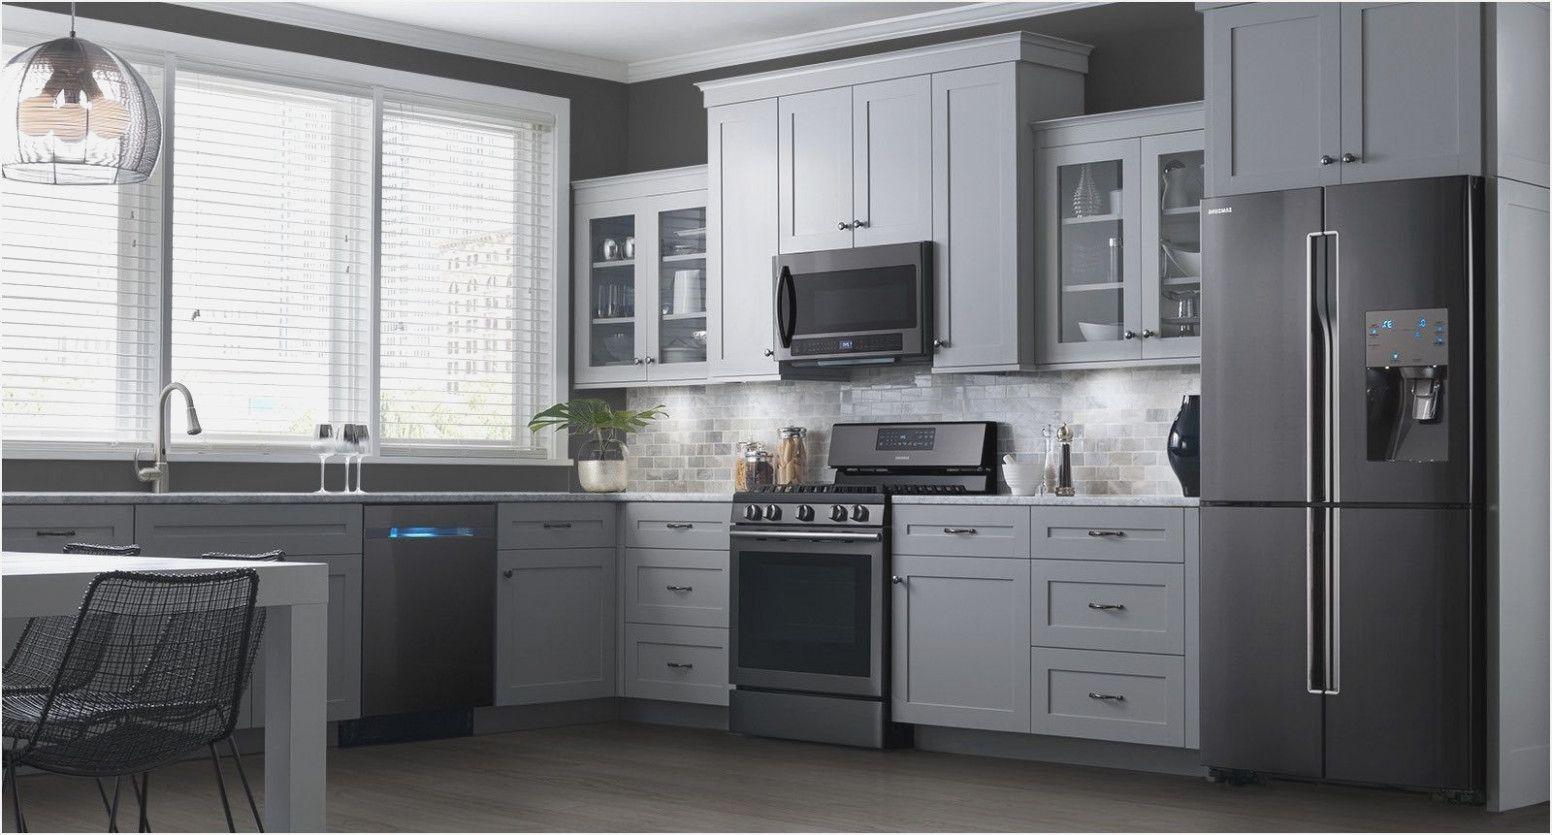 Kitchenaid Samsung Black Stainless Steel Appliances Reviews From Black Appliances Kitchen Black Stainless Appliances Slate Appliances Kitchen